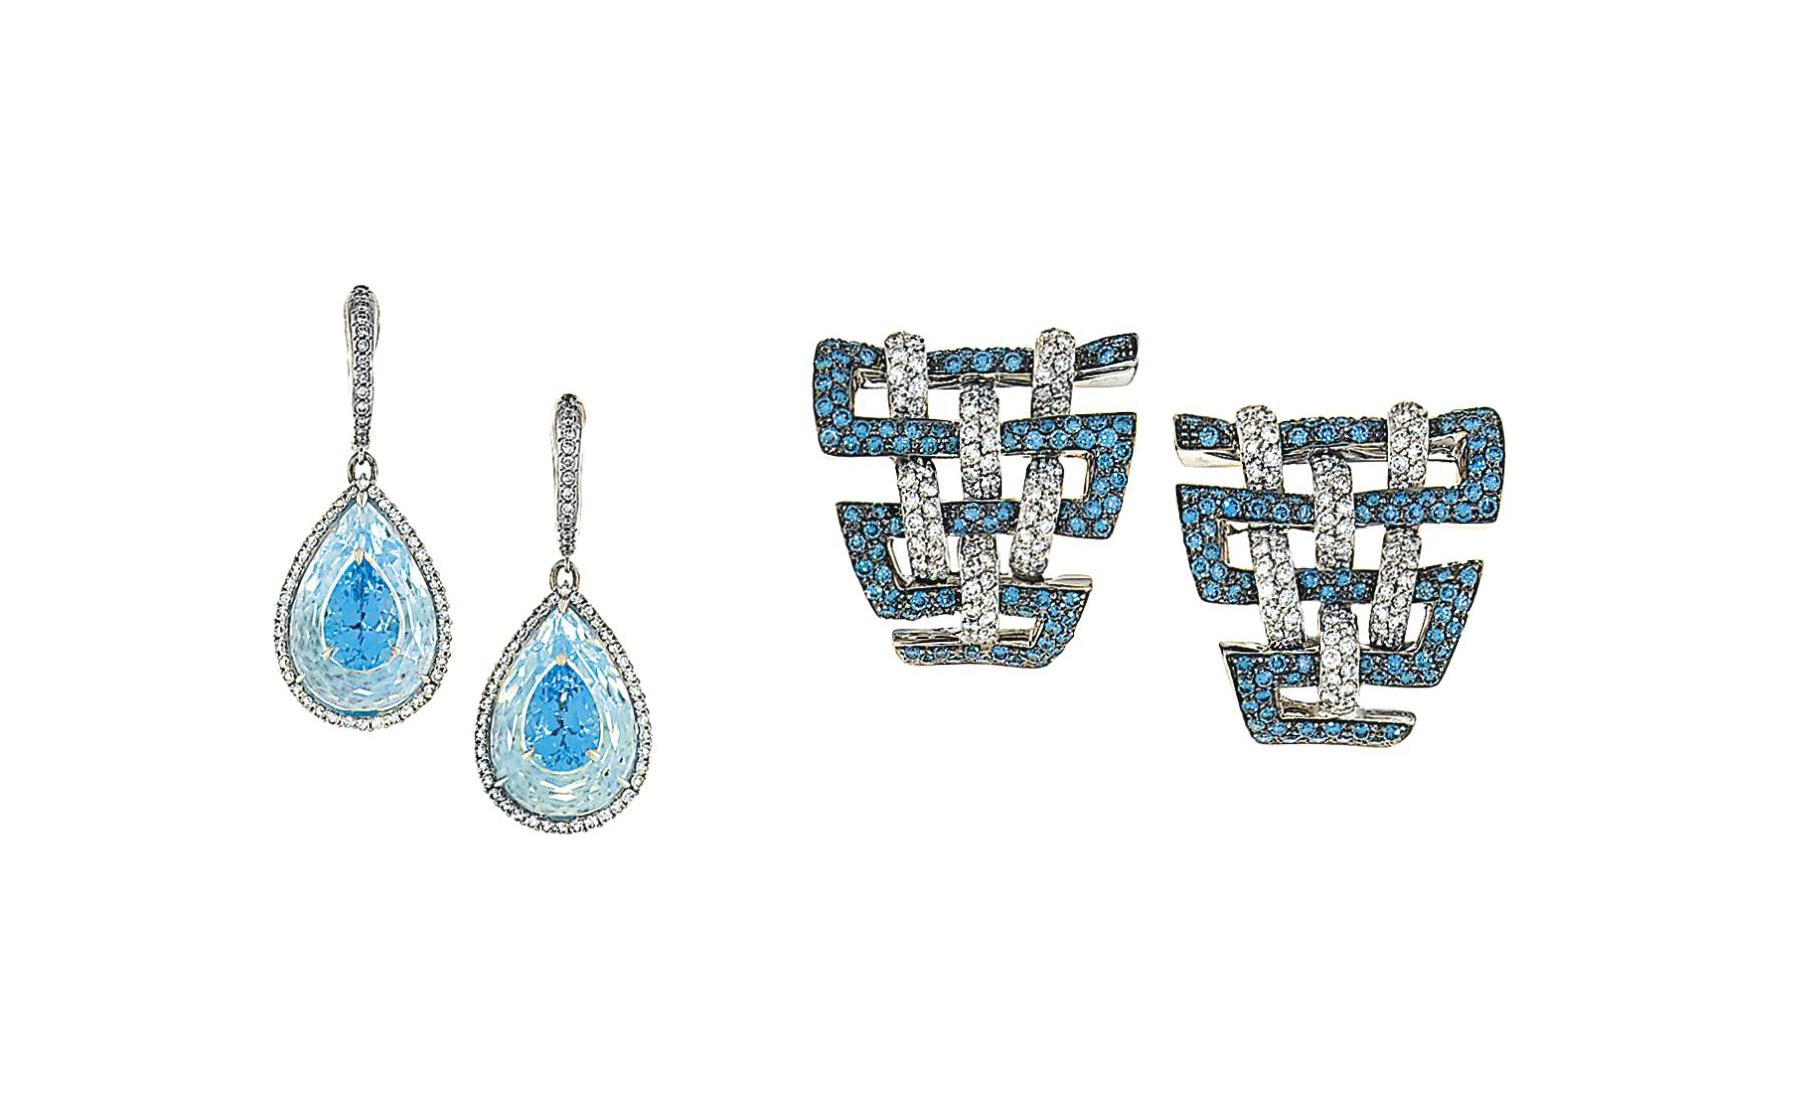 Two pairs of gem-set earrings, one by Bogh-Art